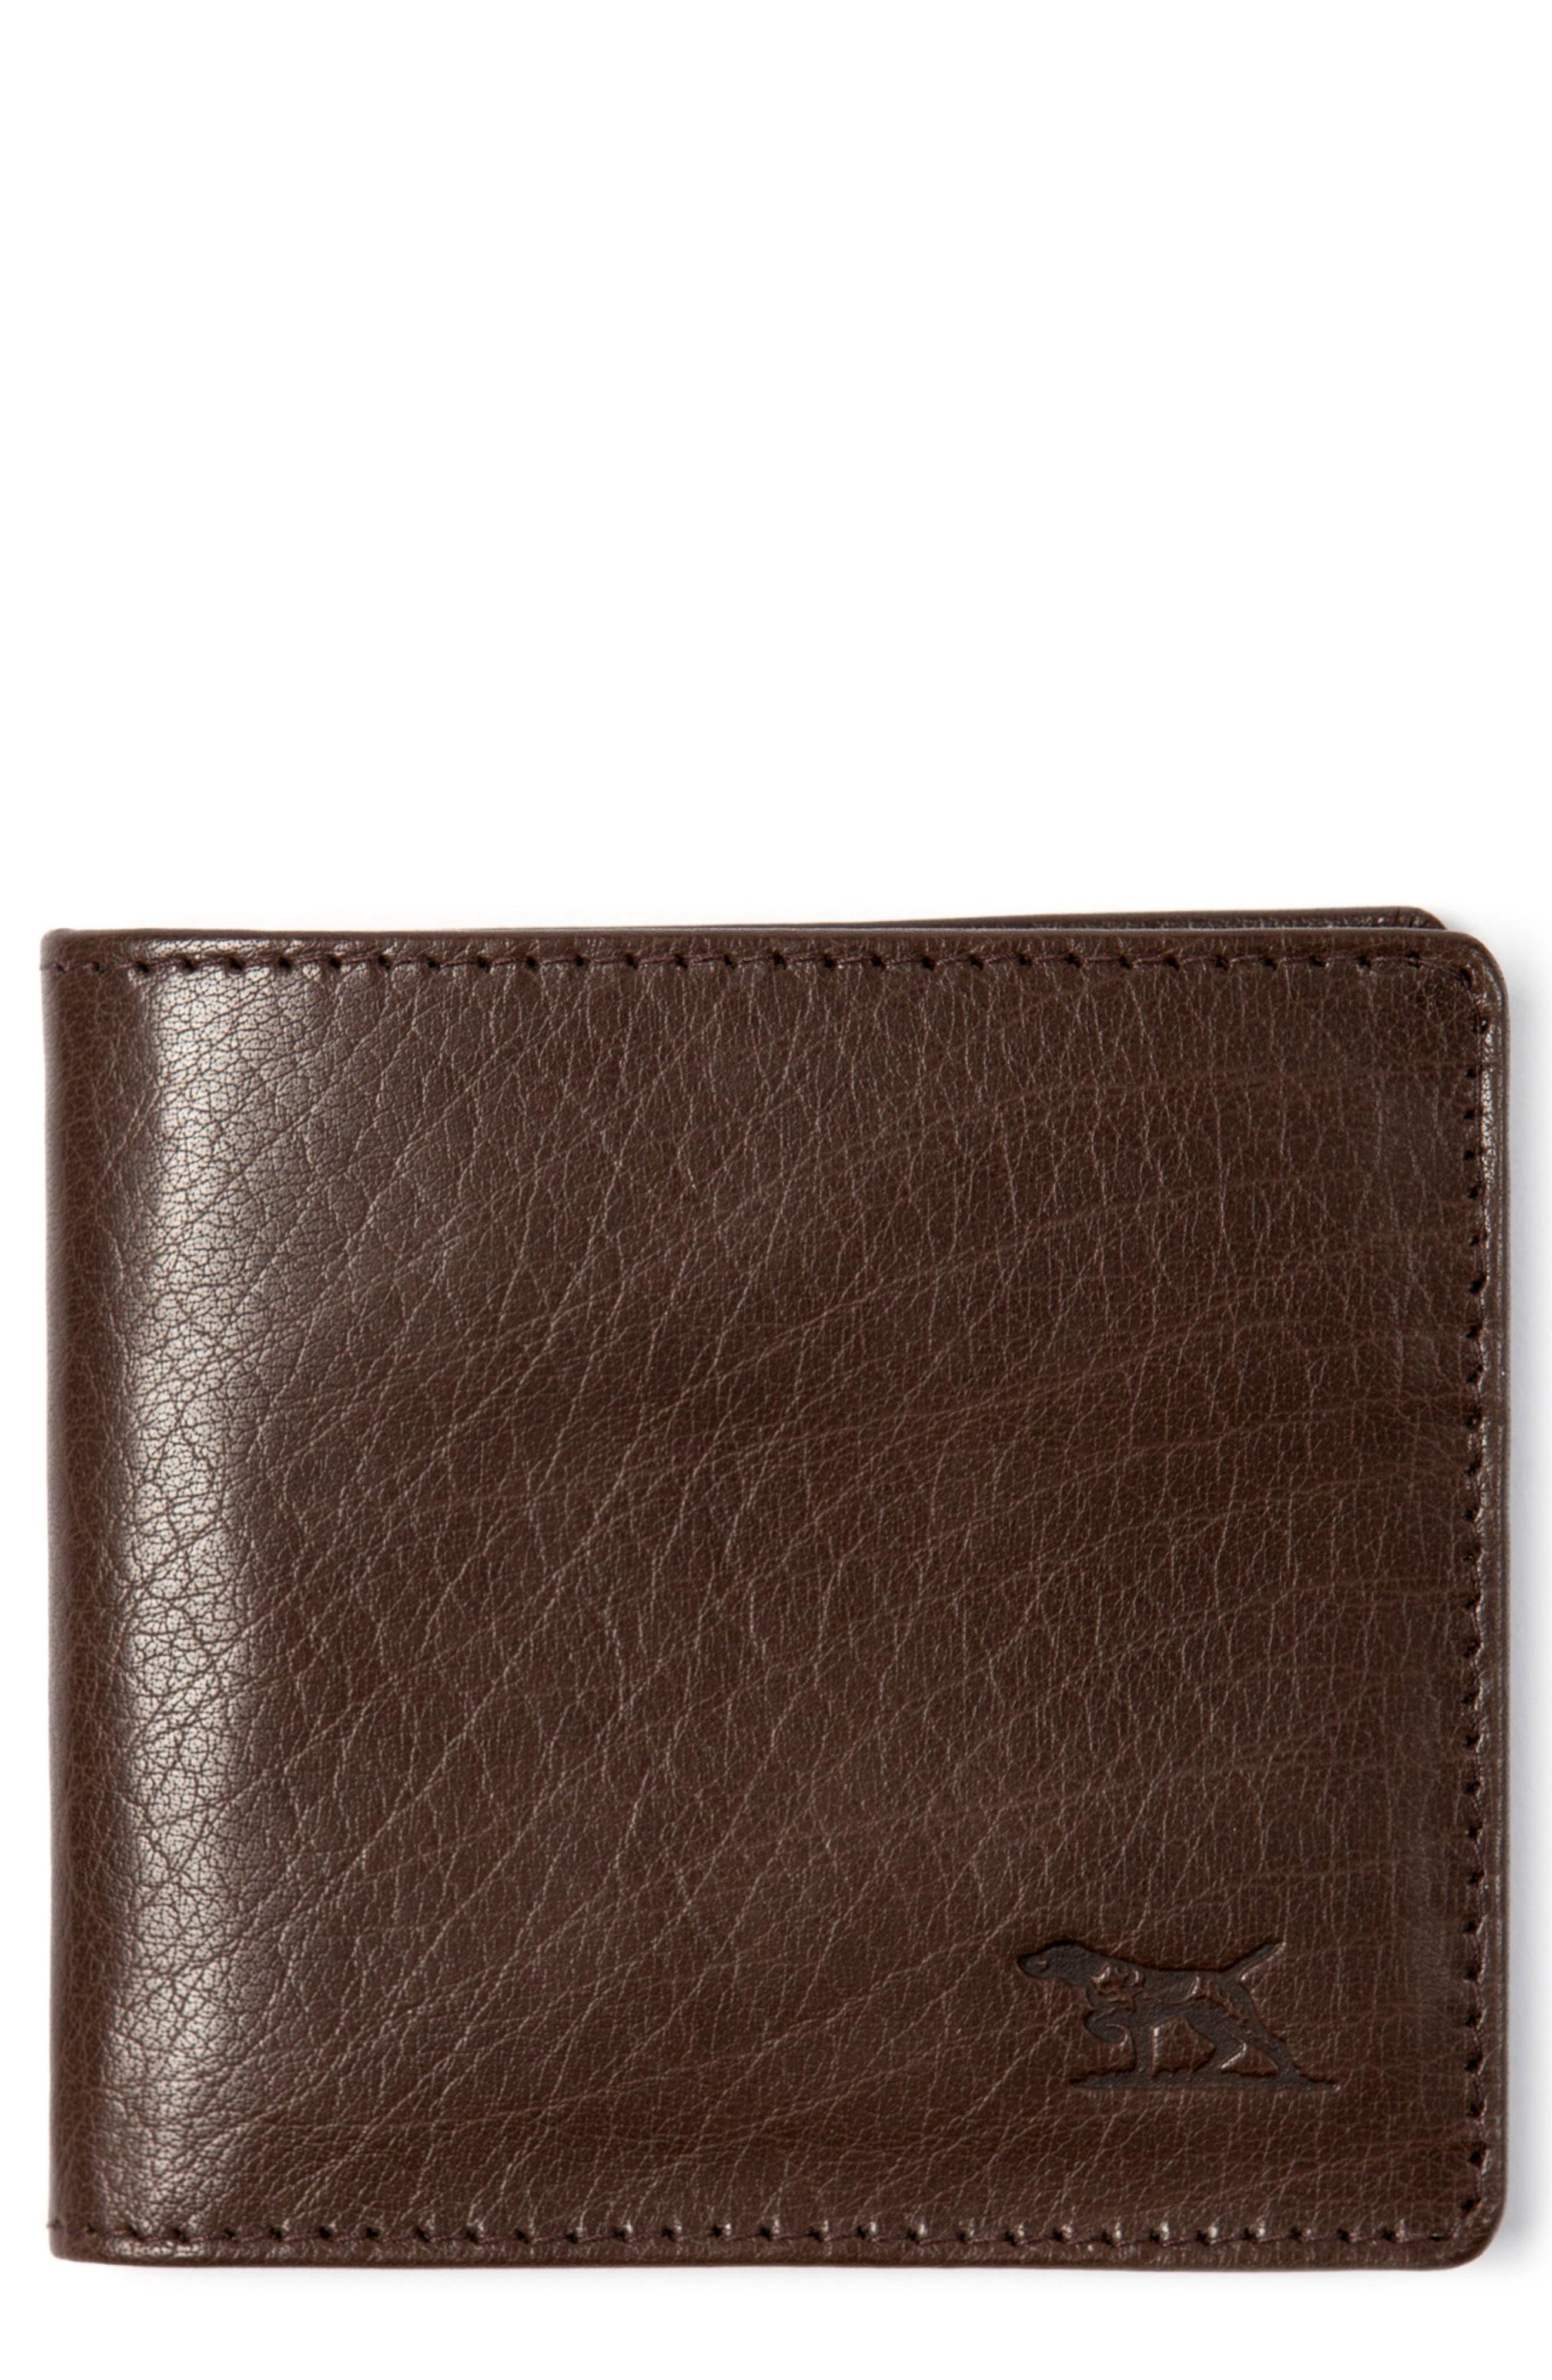 RODD & GUNN Marybank Wallet